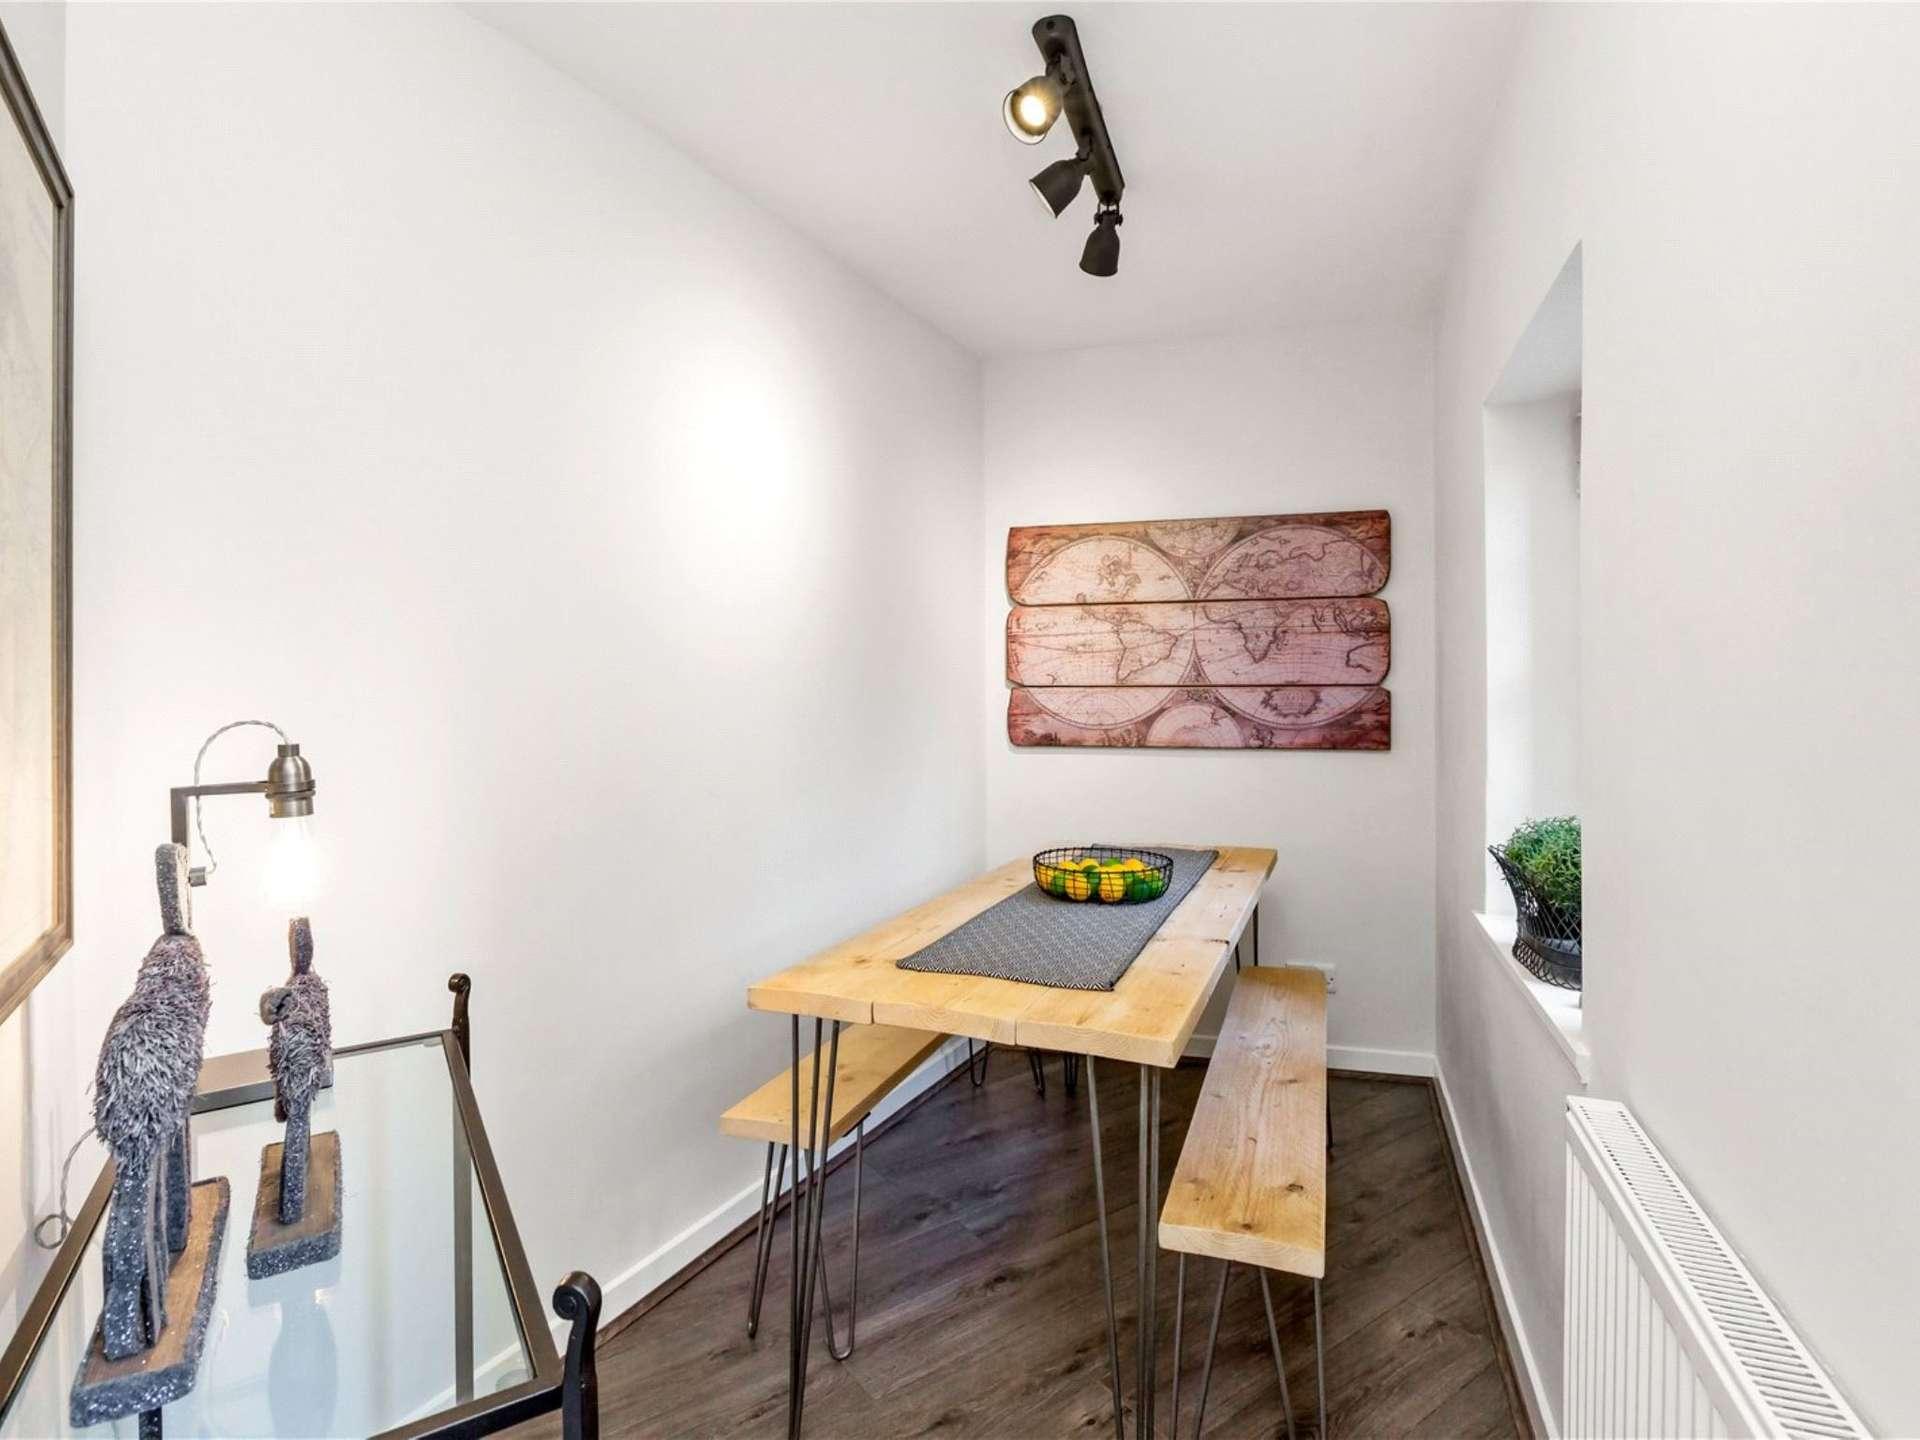 Savills | 3A Torphichen Street, West End, Edinburgh, EH3 8HX | Properties  for sale